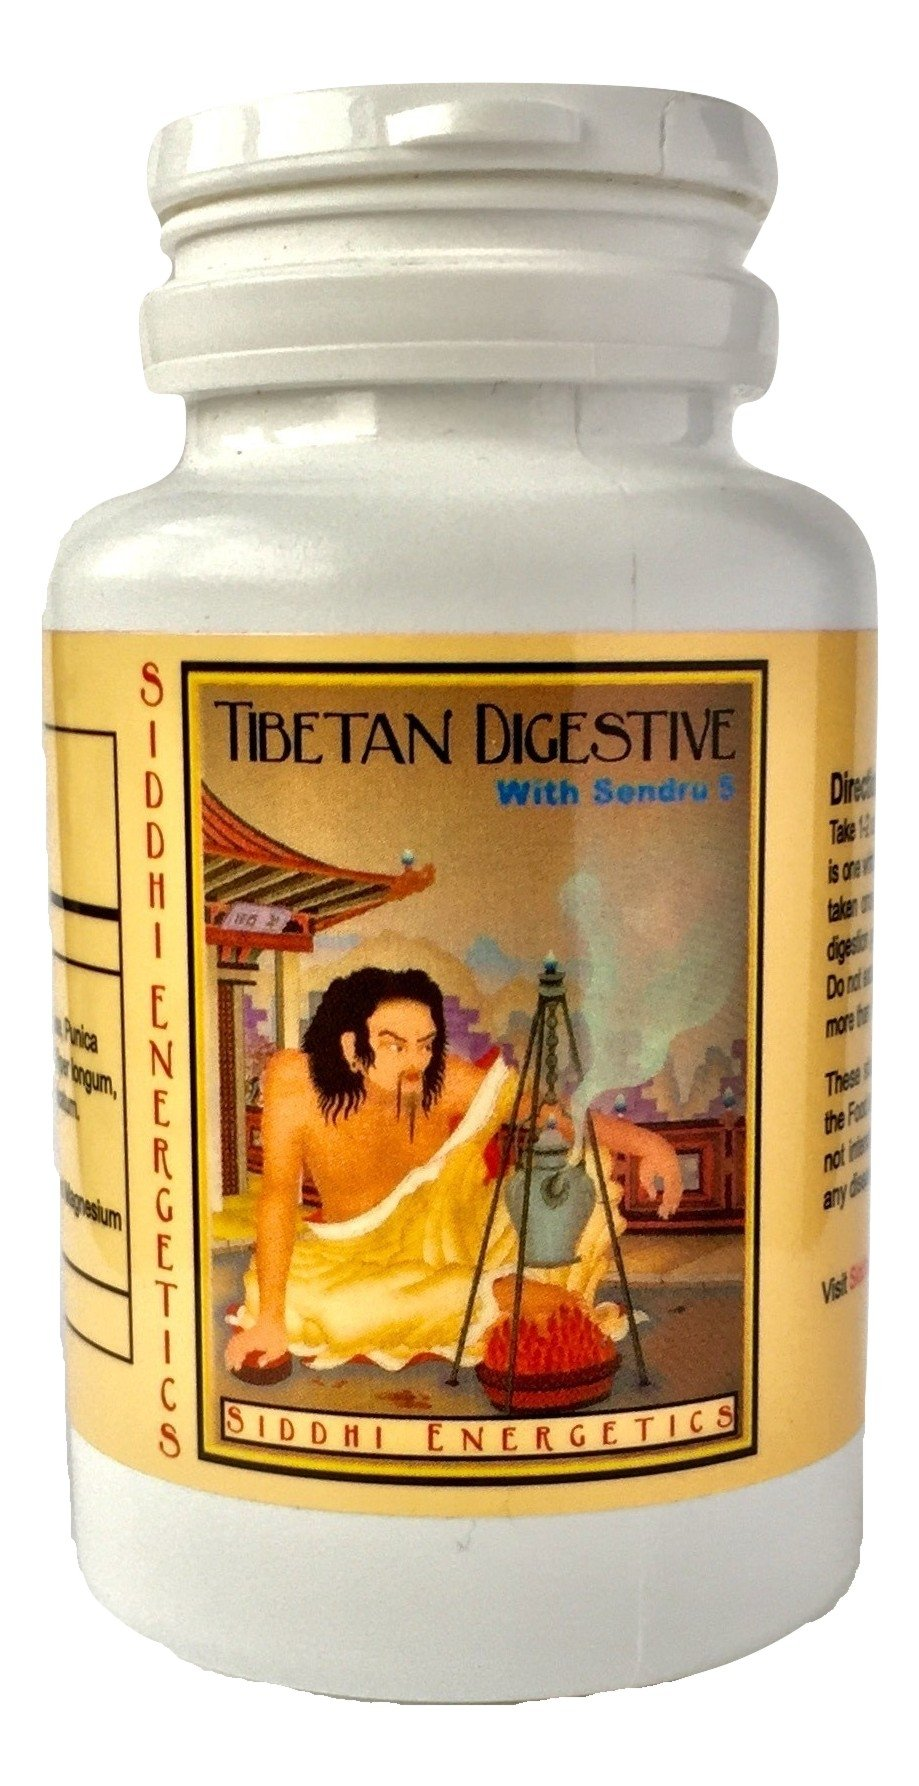 Tibetan Digestive with Sendru 5 by Siddhi Energetics